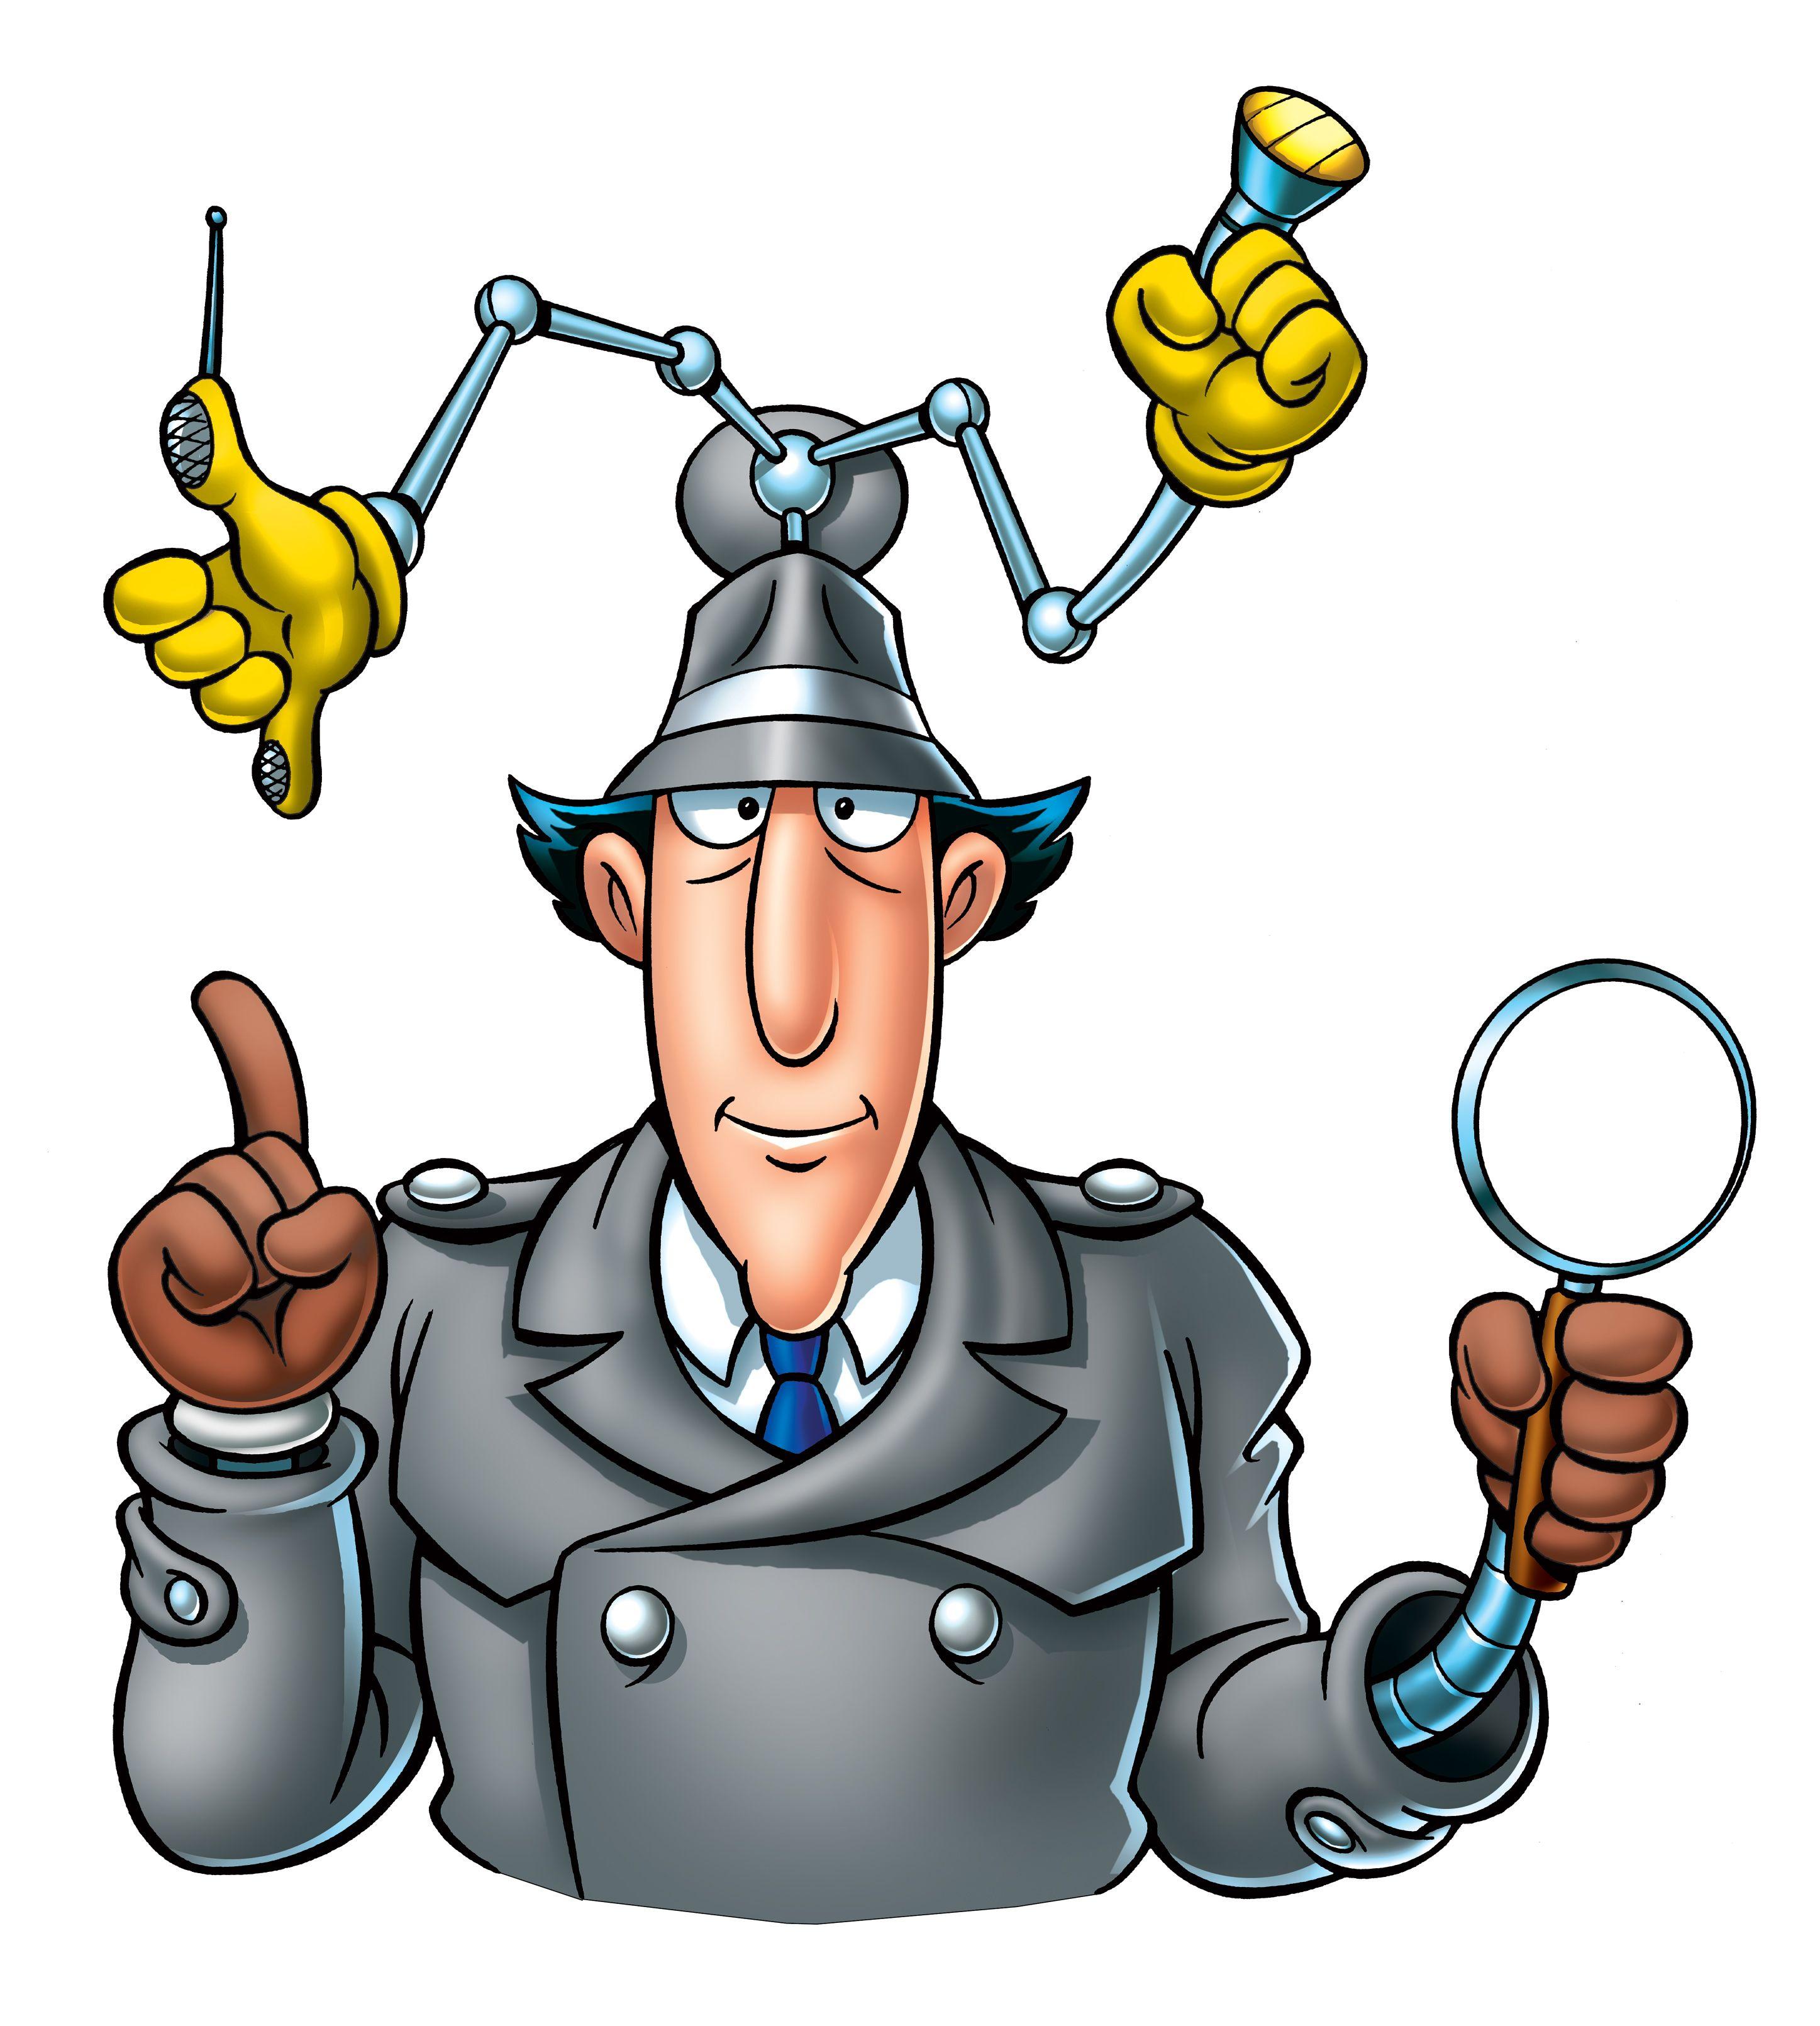 inspector gadget golden age of catroons inspector gadget